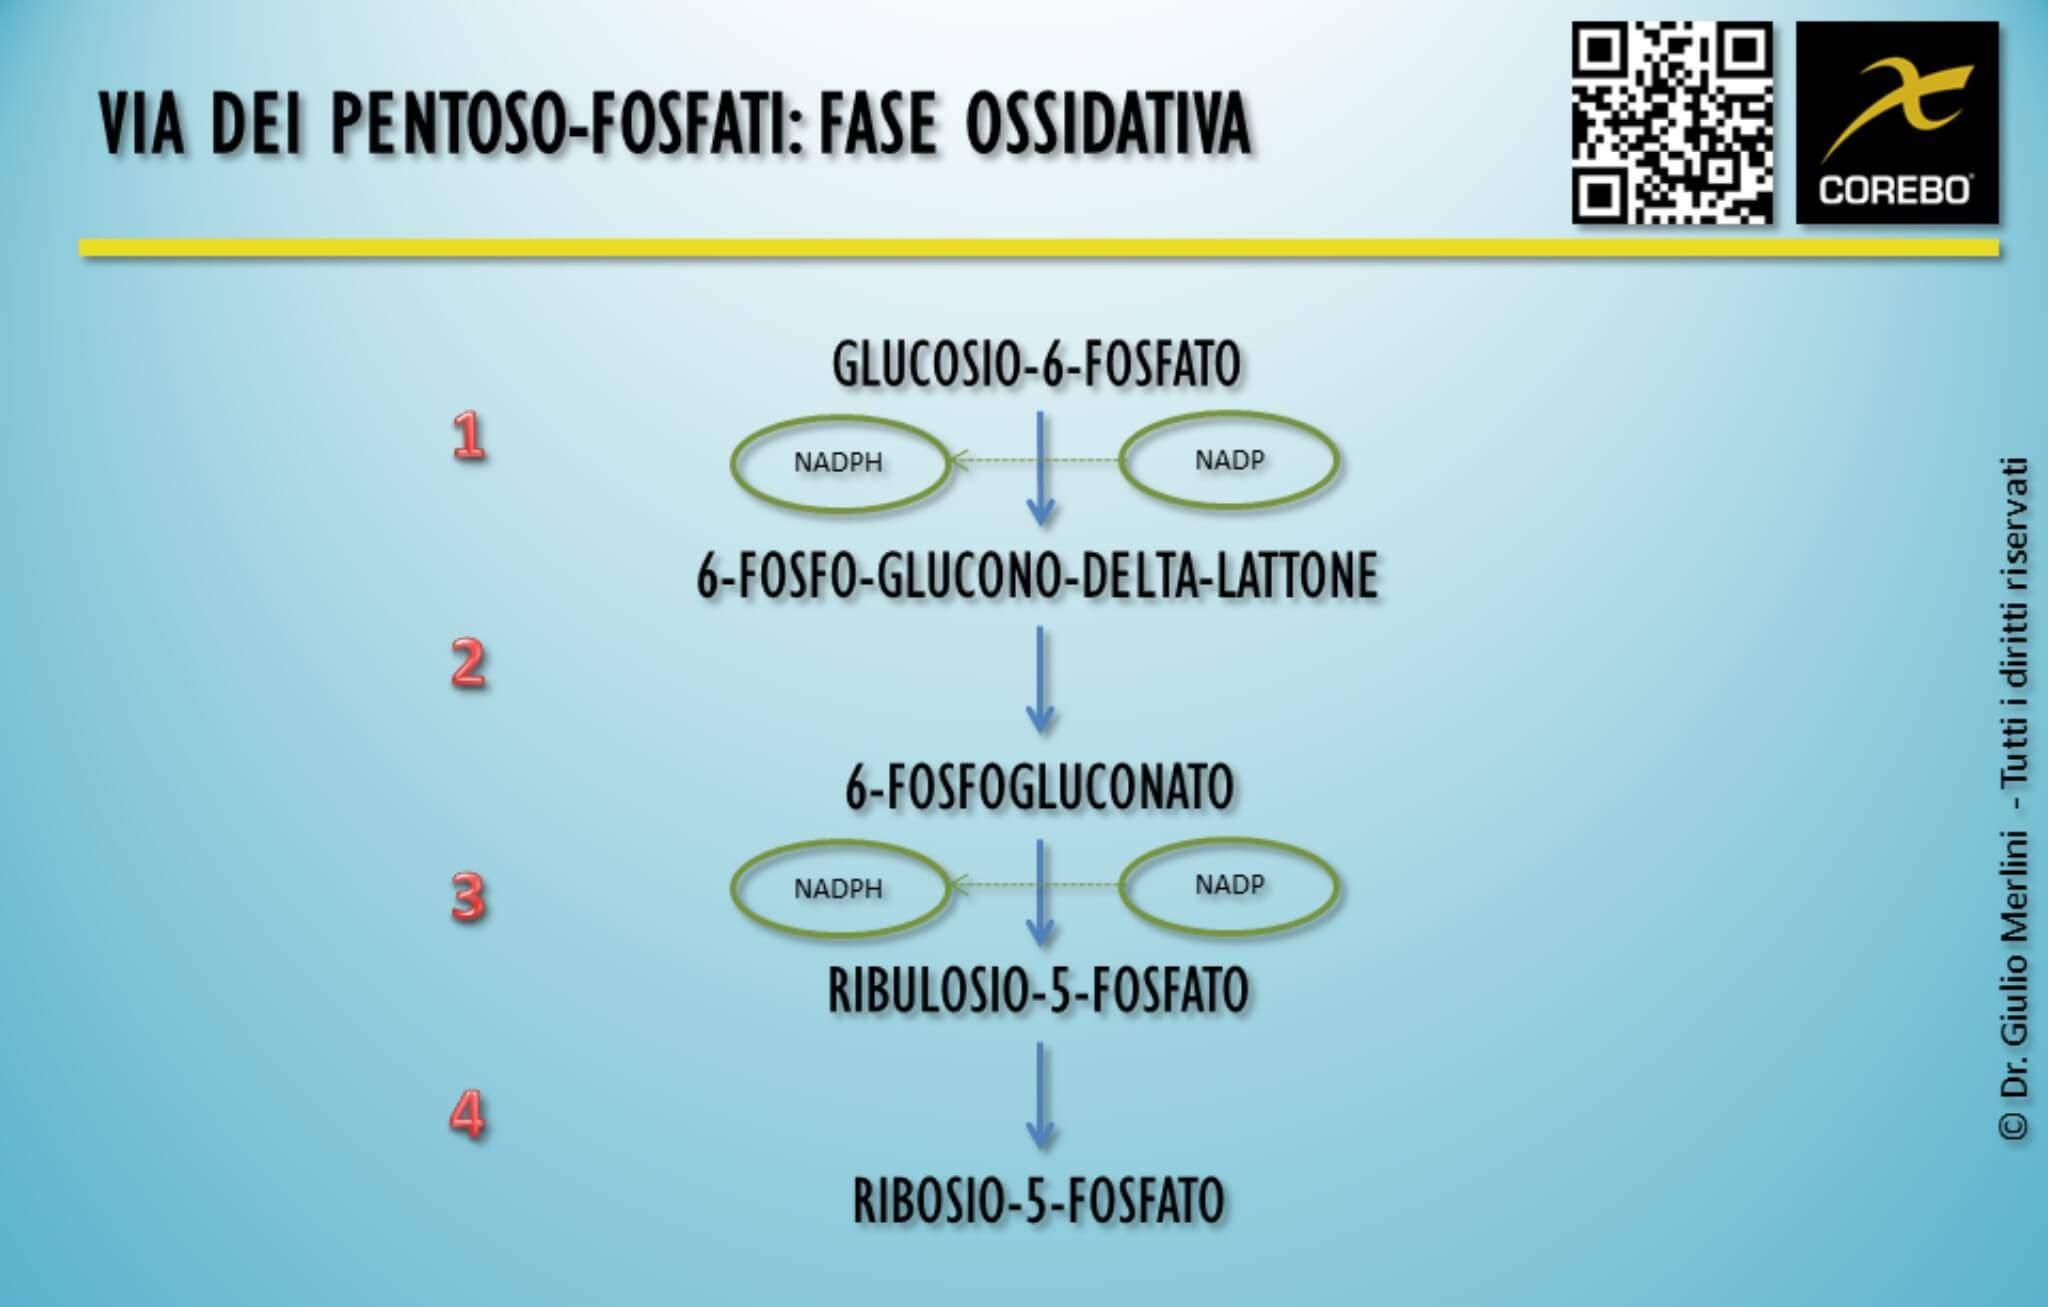 ciclo pentoso fosfati